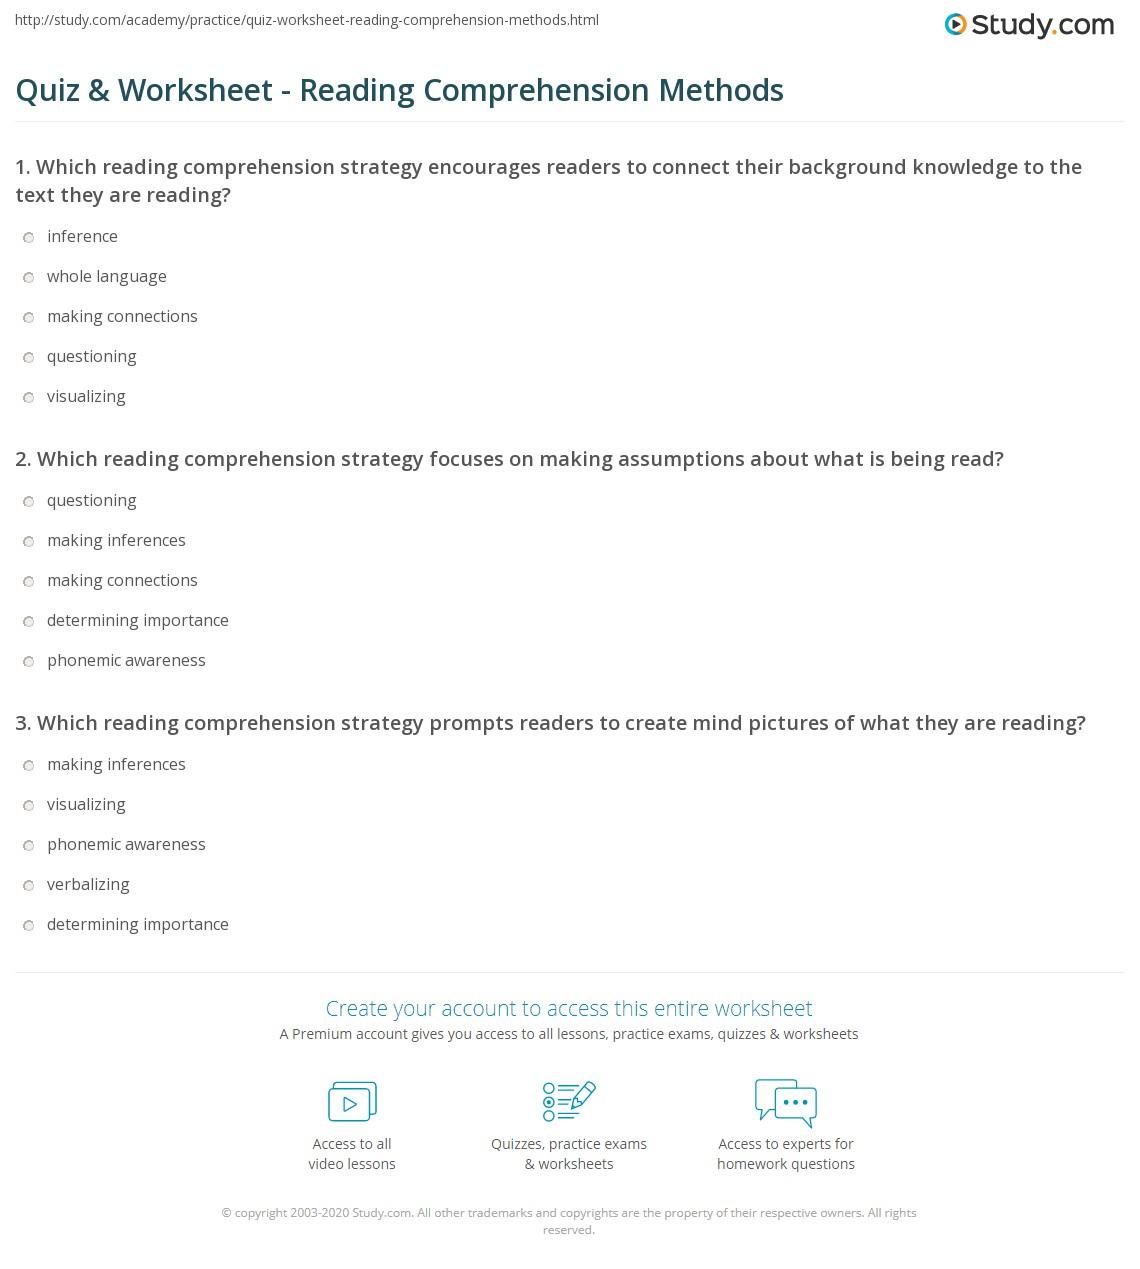 - Quiz & Worksheet - Reading Comprehension Methods Study.com